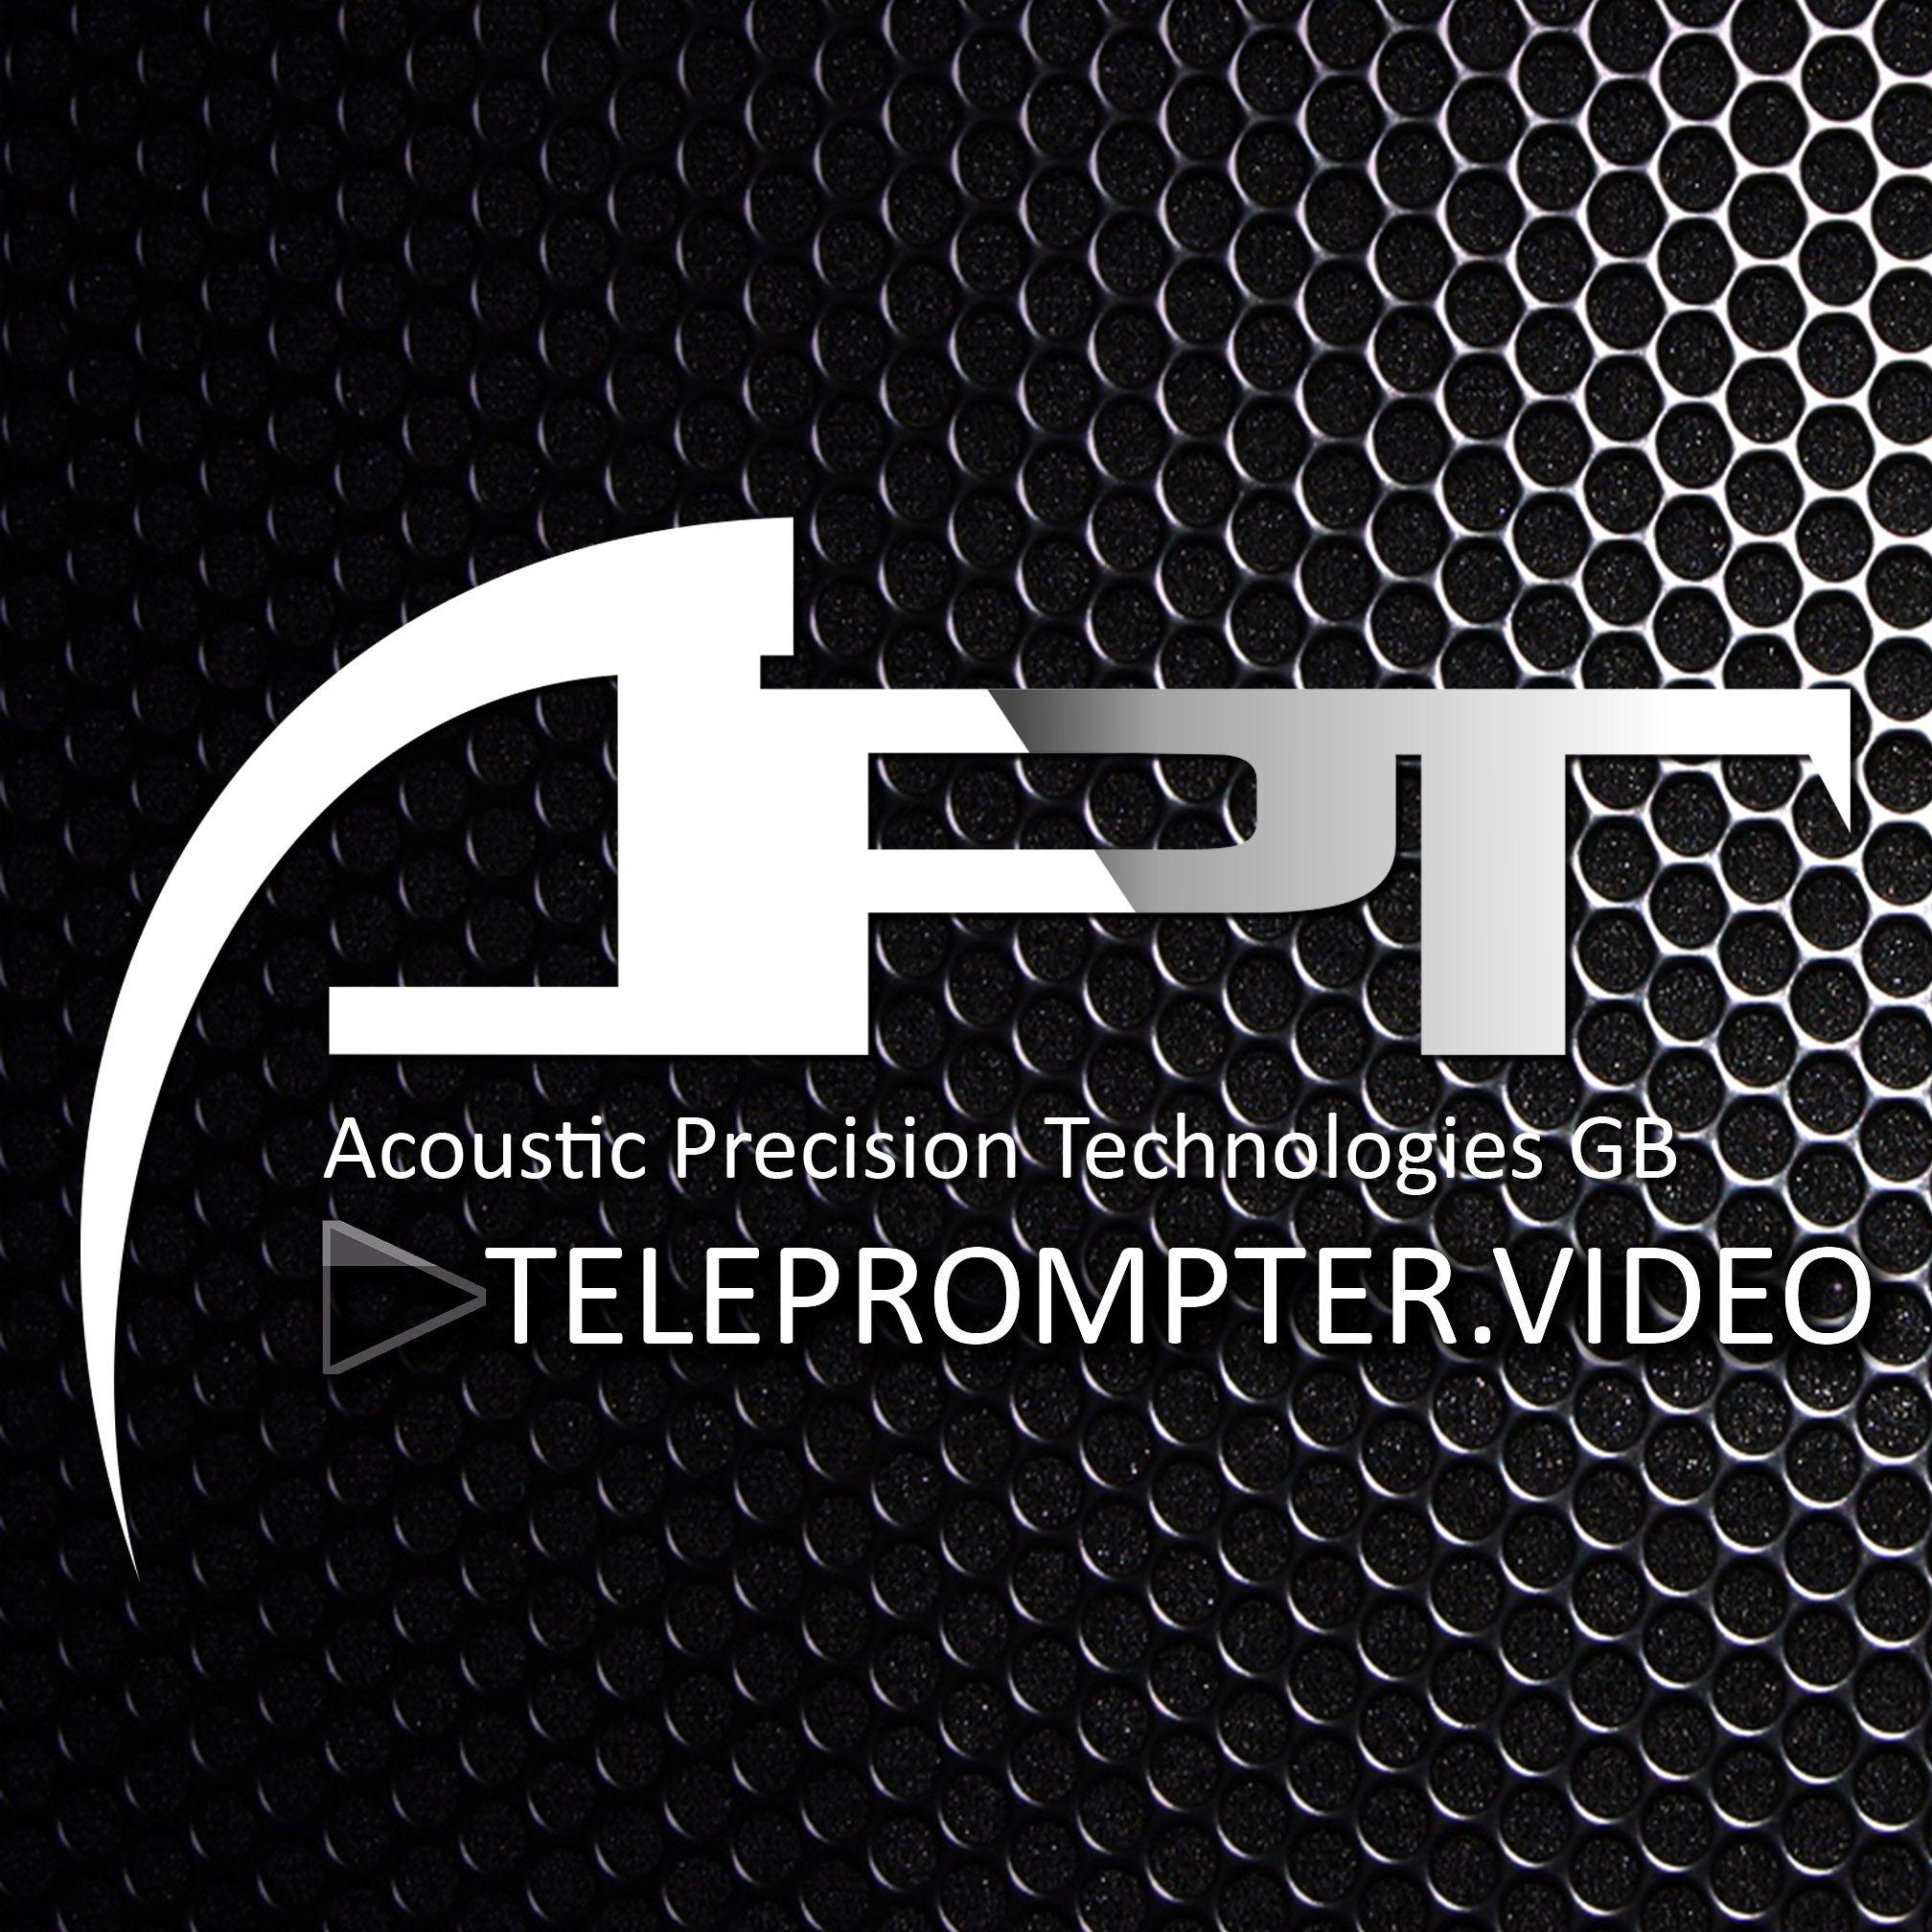 Apt-GB (teleprompter.video)